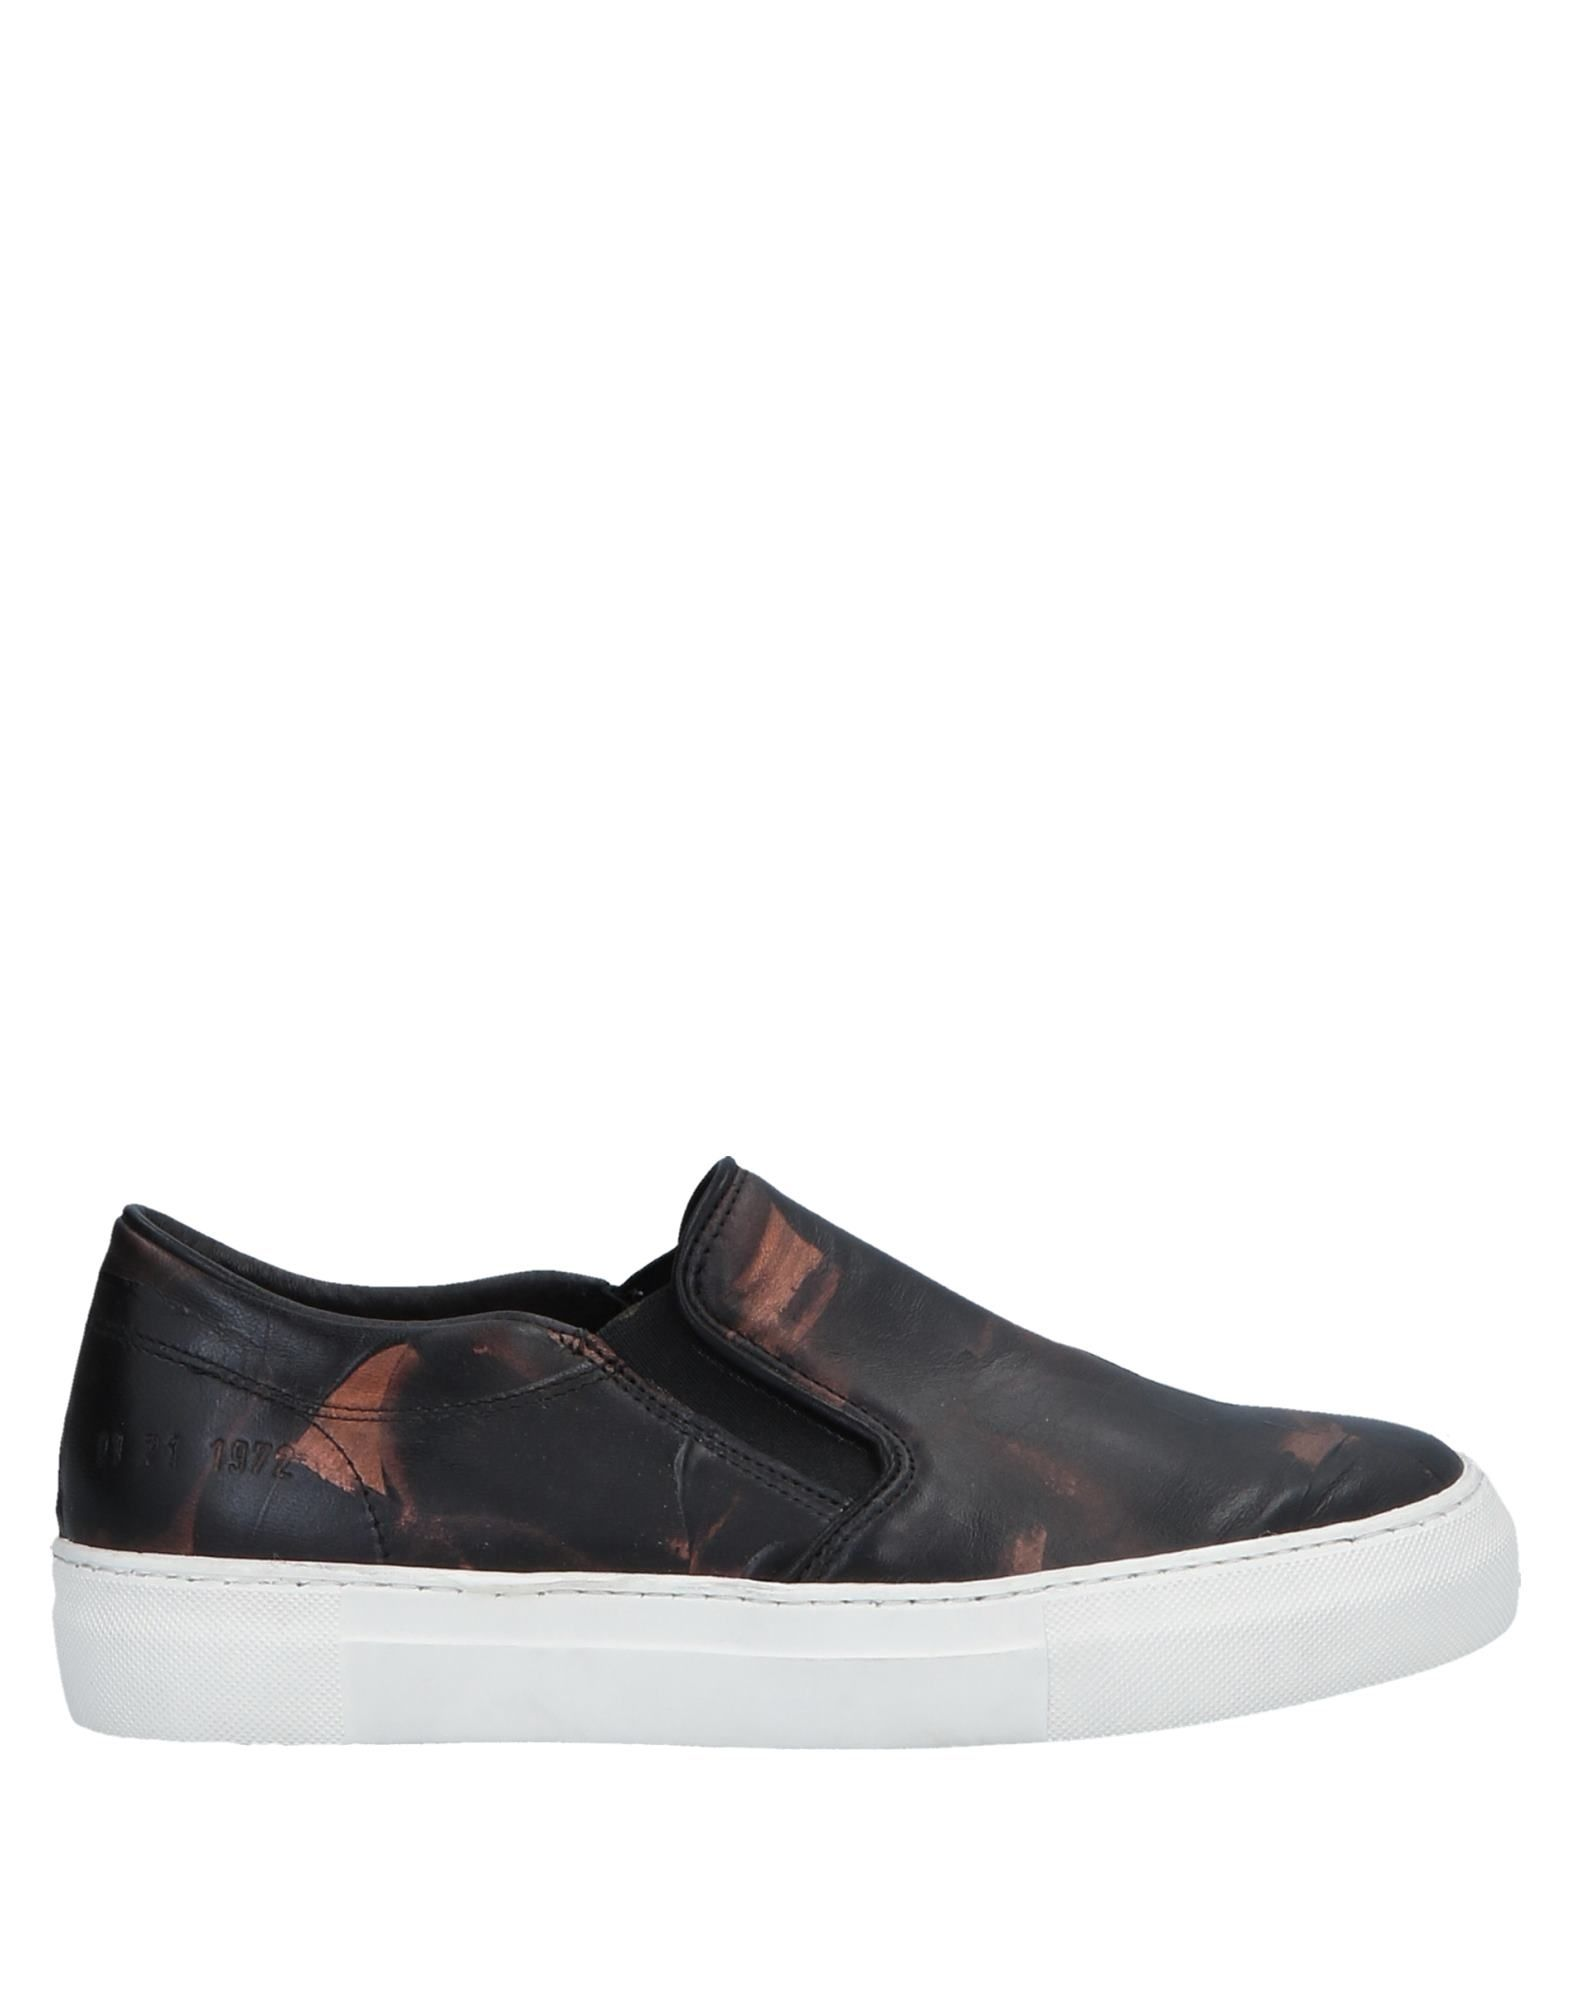 Keep Originals Sneakers Damen  11519695AU Gute Qualität beliebte Schuhe